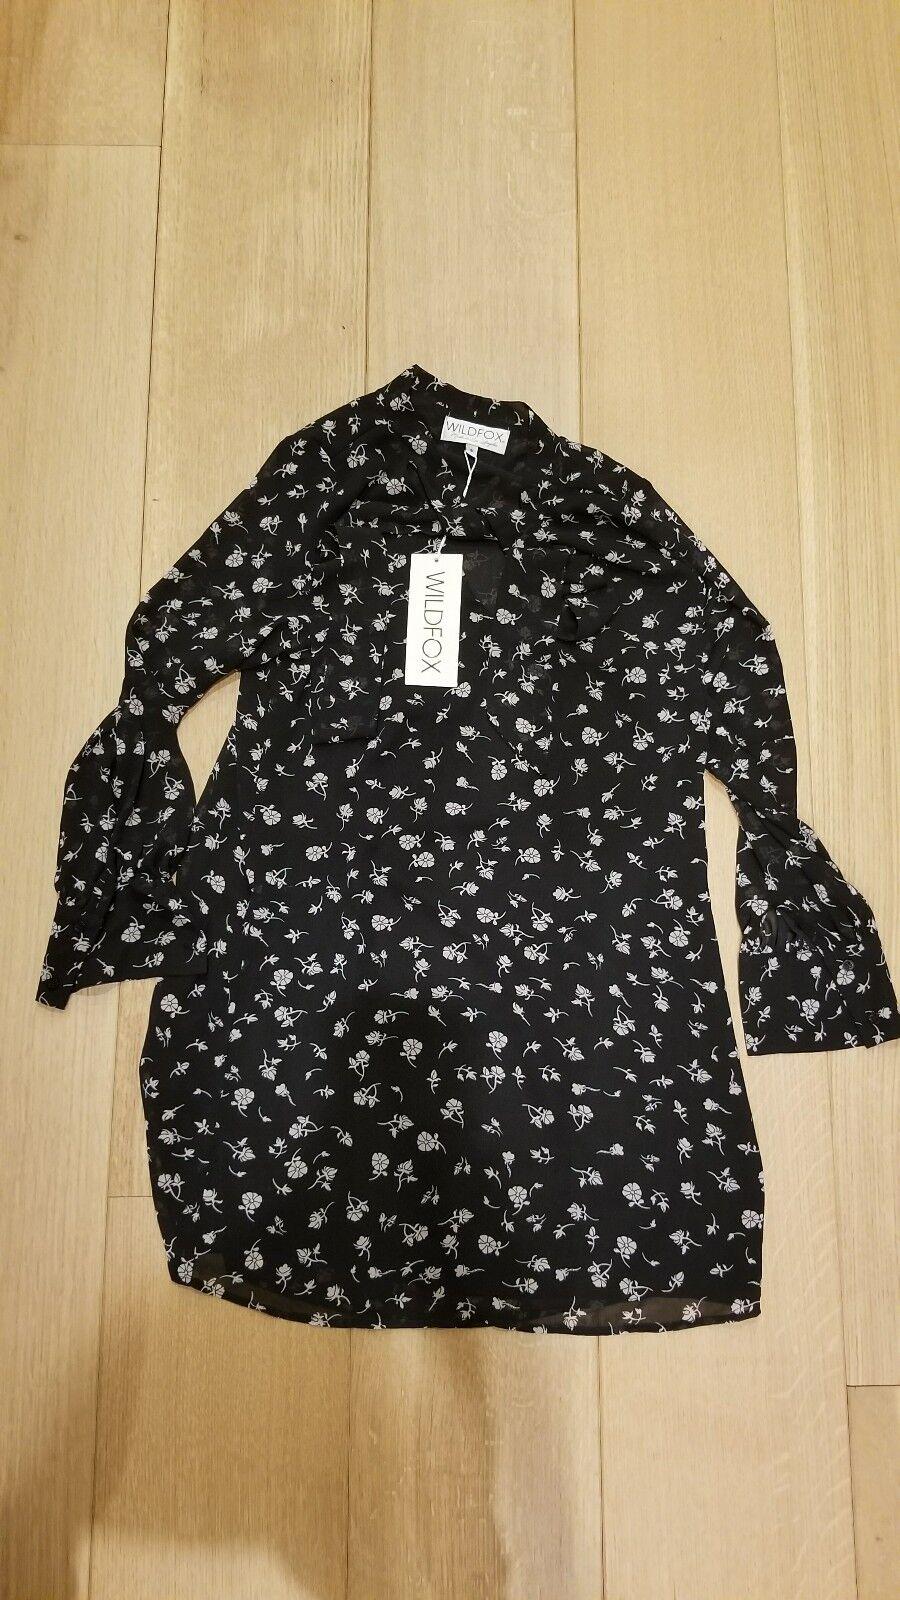 Wildfox adore dress New schwarz small